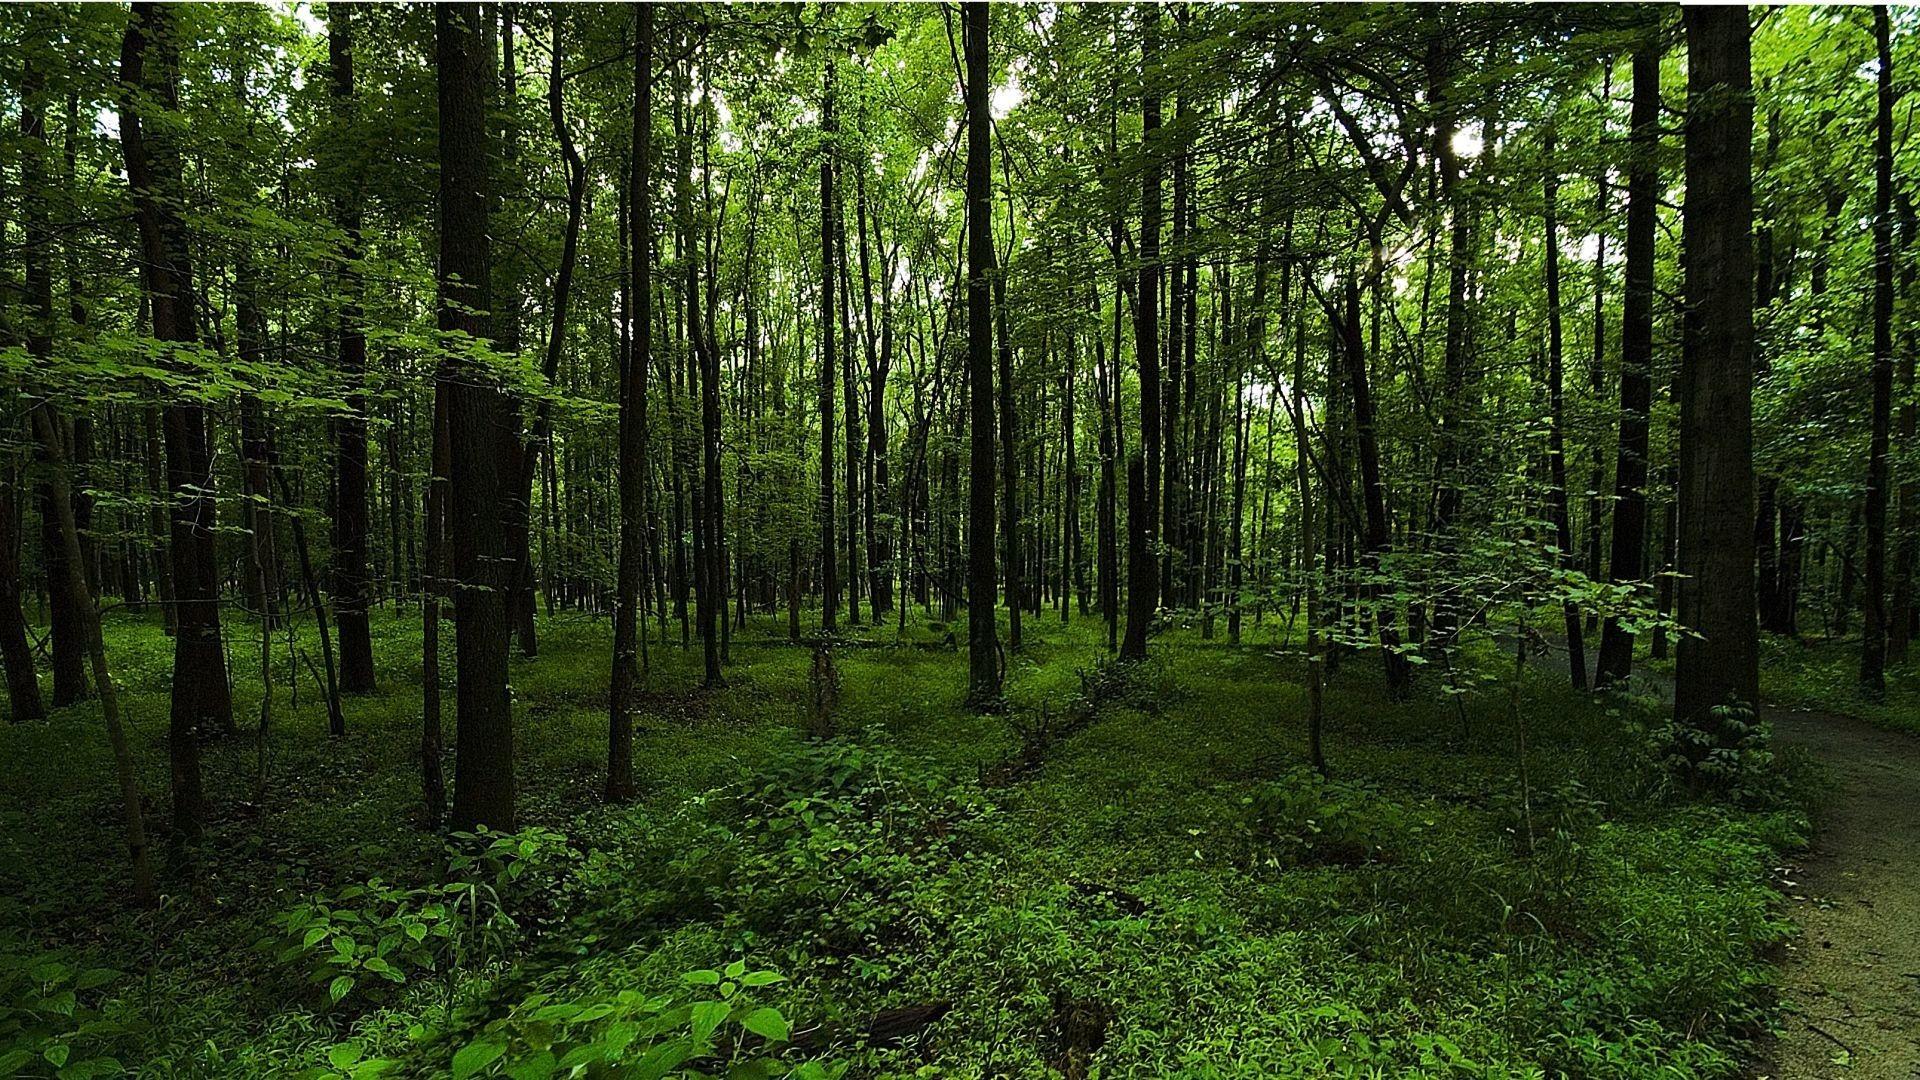 cropped-cropped-dark-green-forest-background-2.jpg